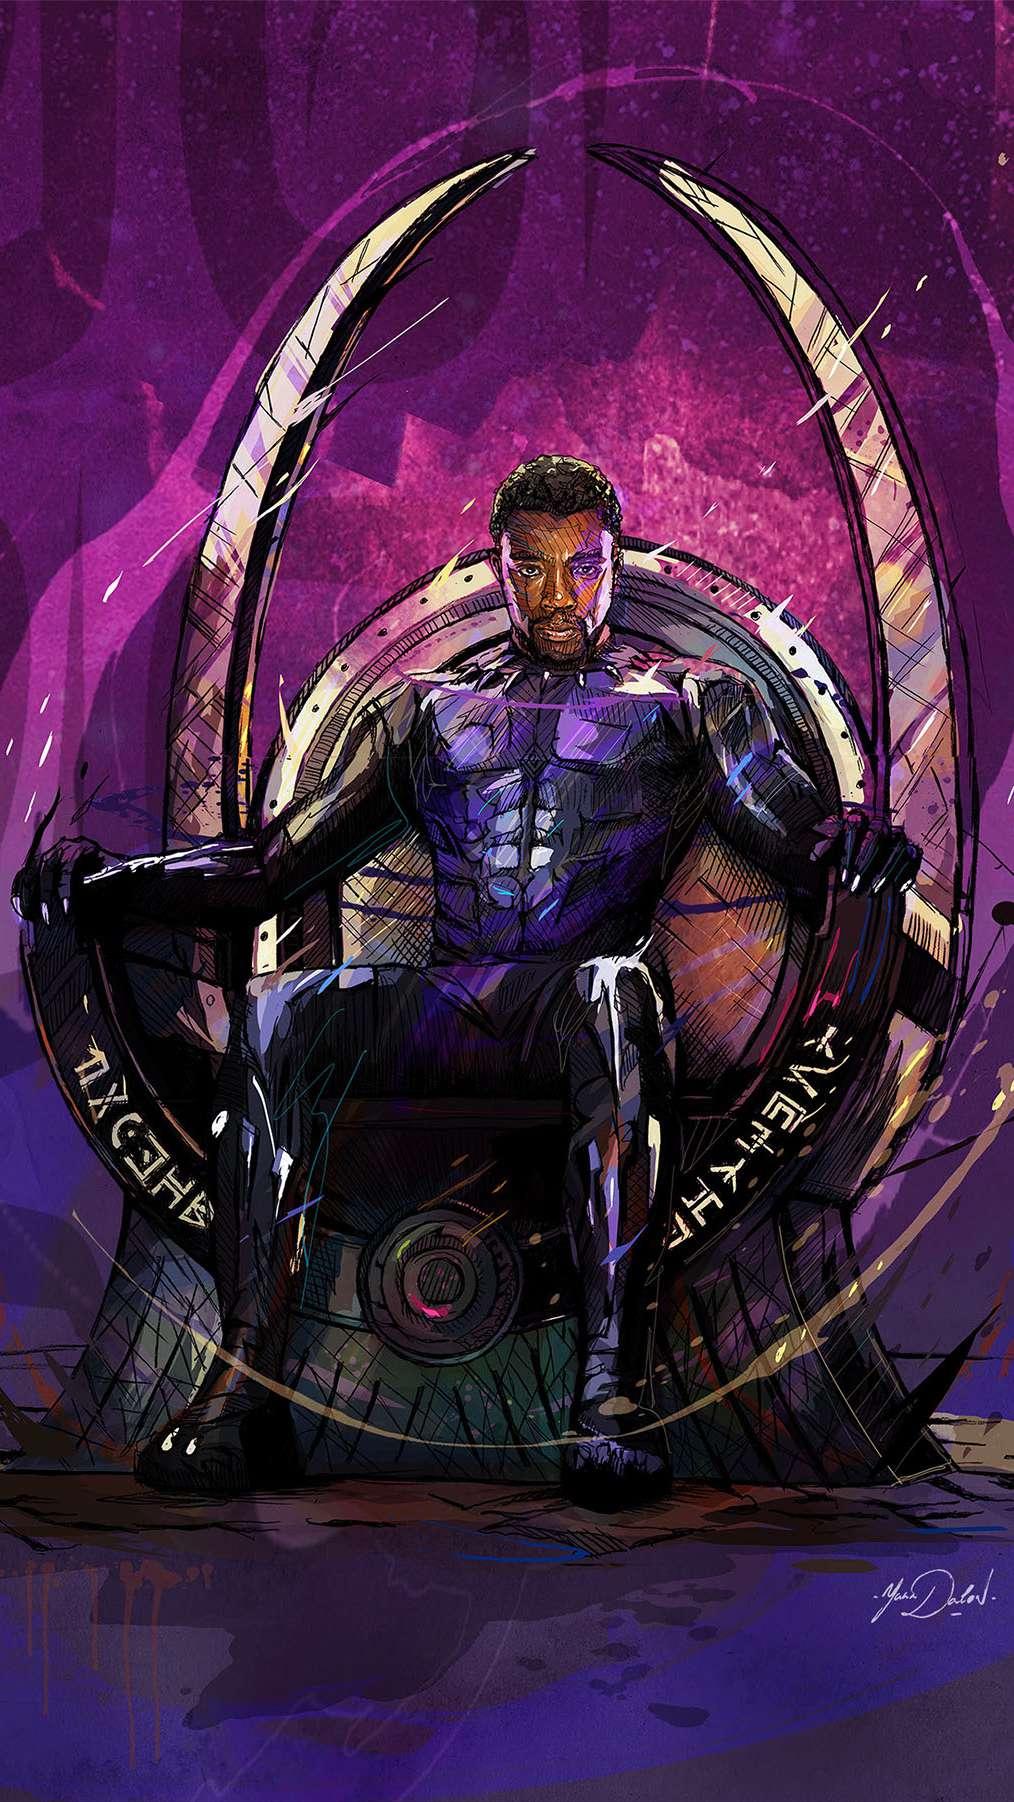 Cute Black Panther Wallpaper Black Panther King Of Wakanda Art Iphone Wallpaper